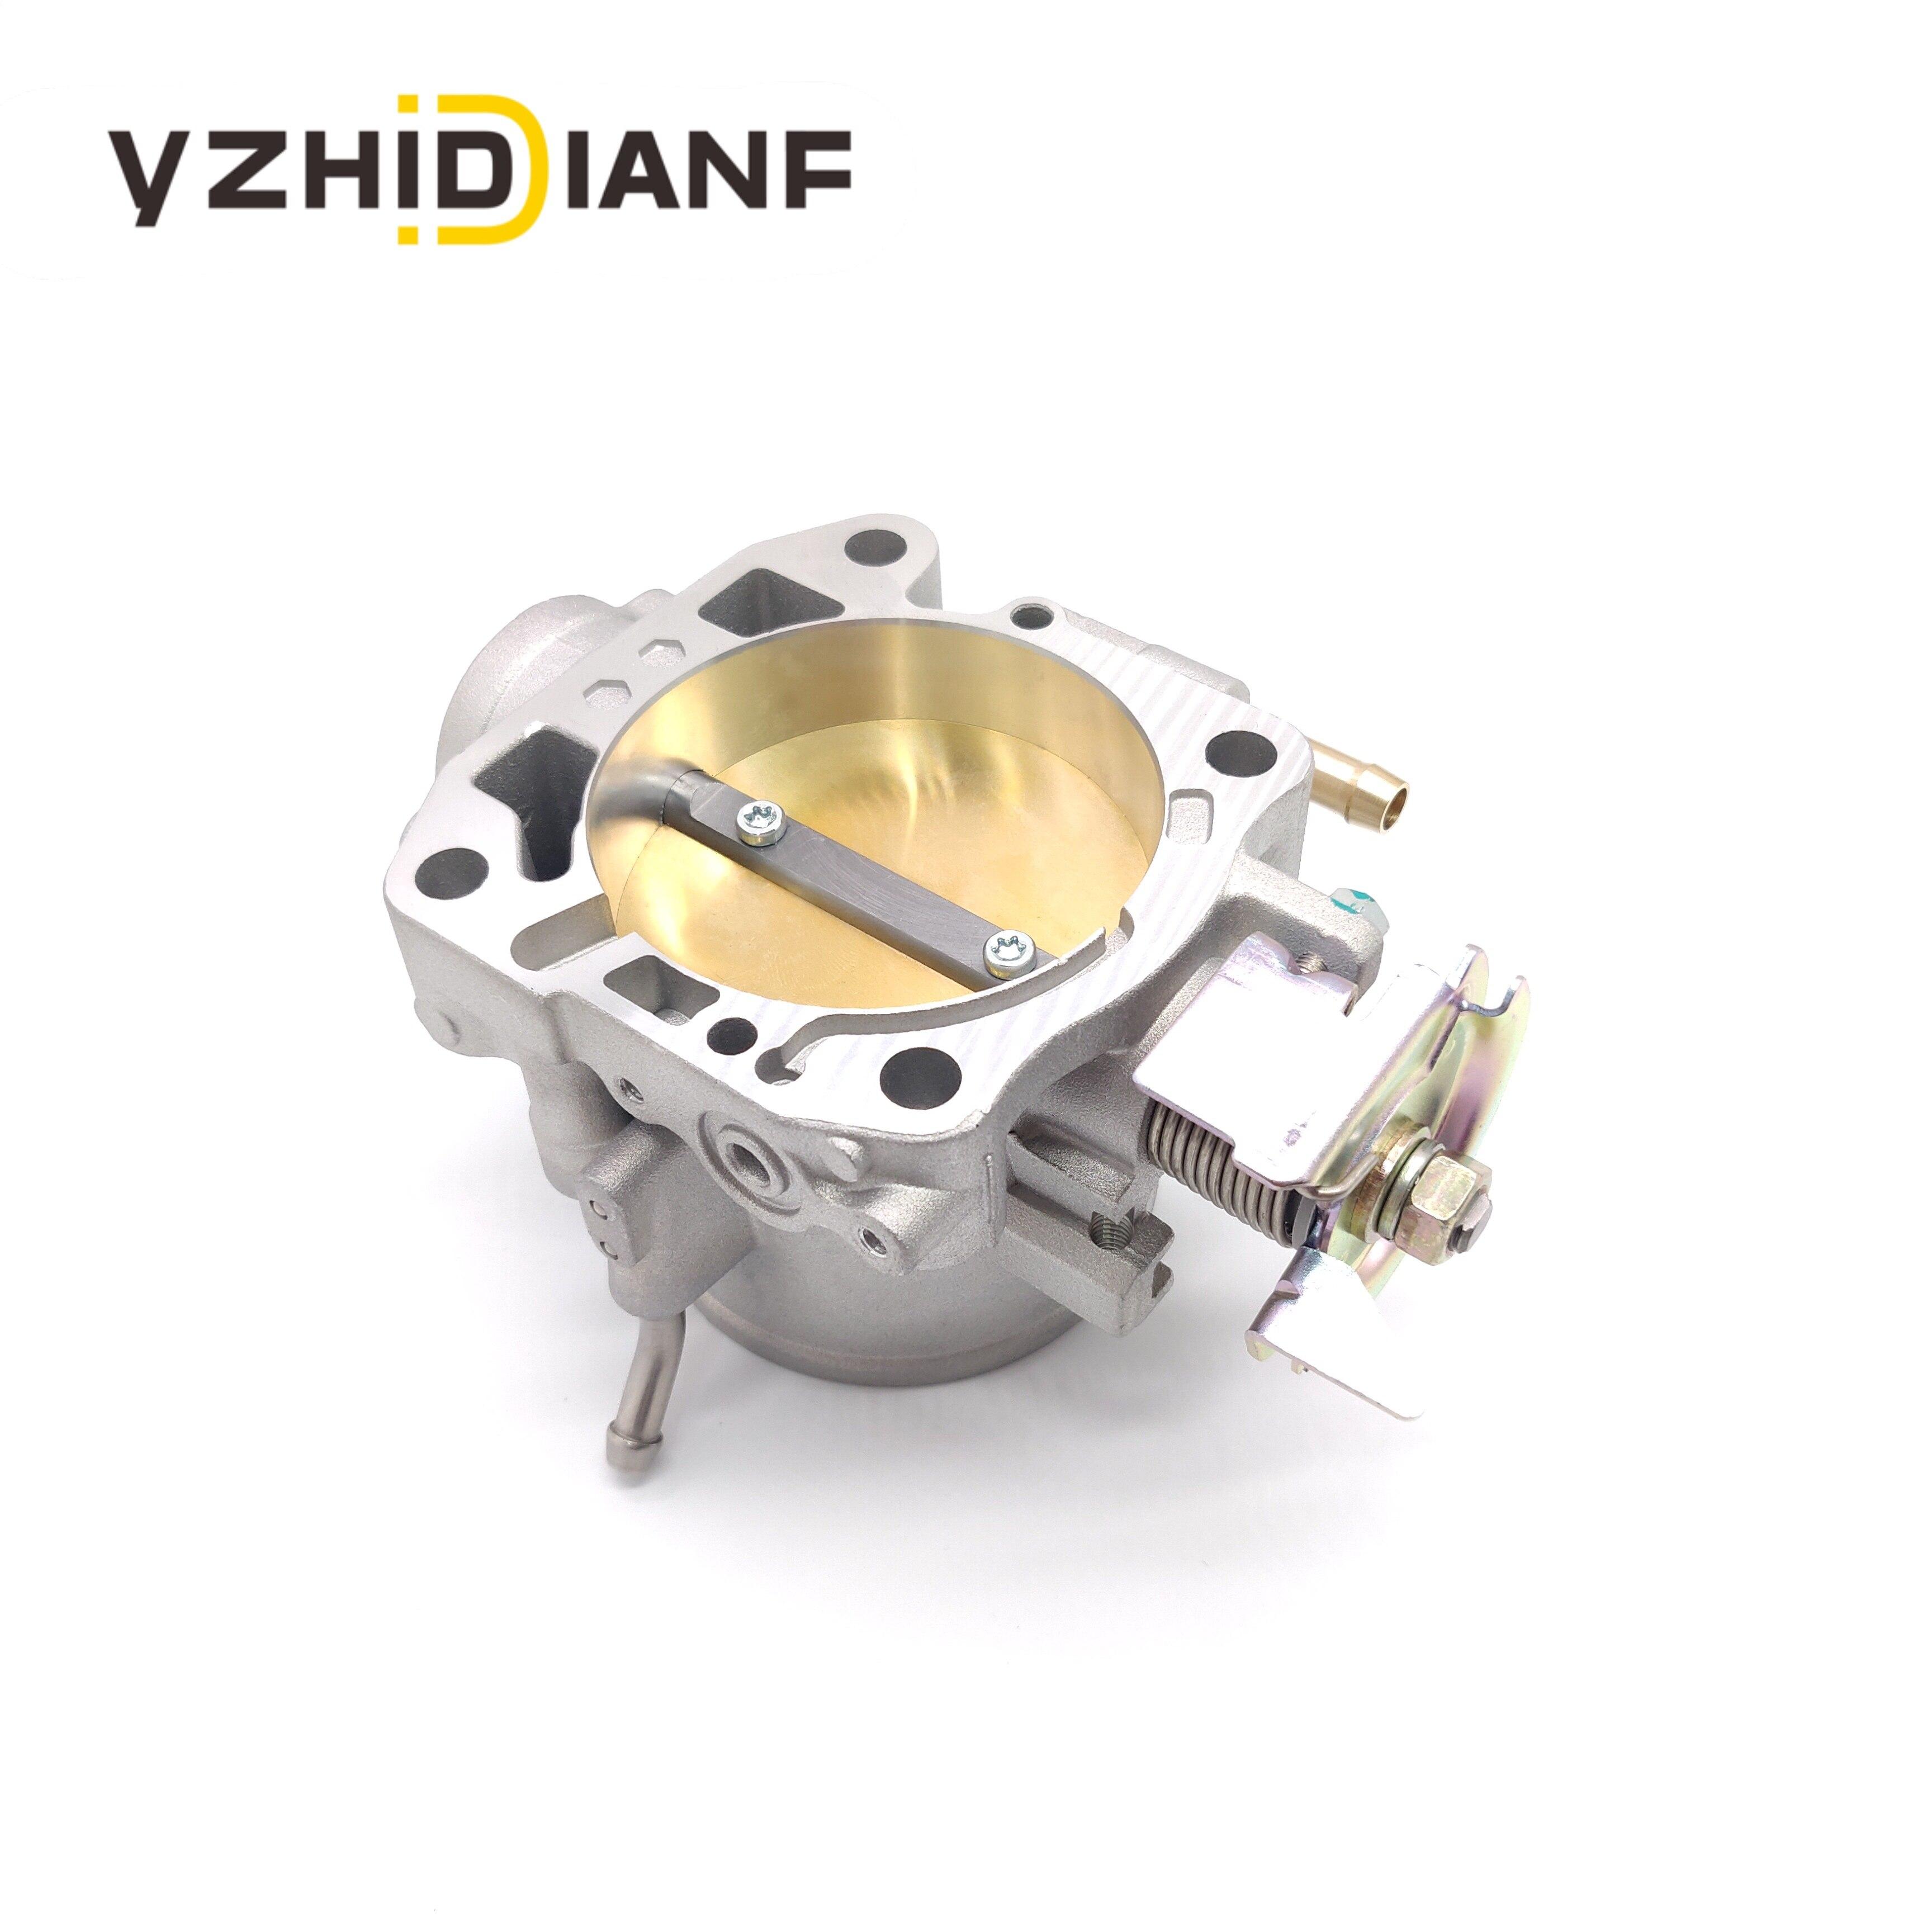 1 pieza del cuerpo del acelerador para Honda-B16 B17 B18 B20 D15 D16 F20 F22 H22 H23 AP03 70mm de aluminio fundido cuerpo del acelerador VR6959 309-05-1050